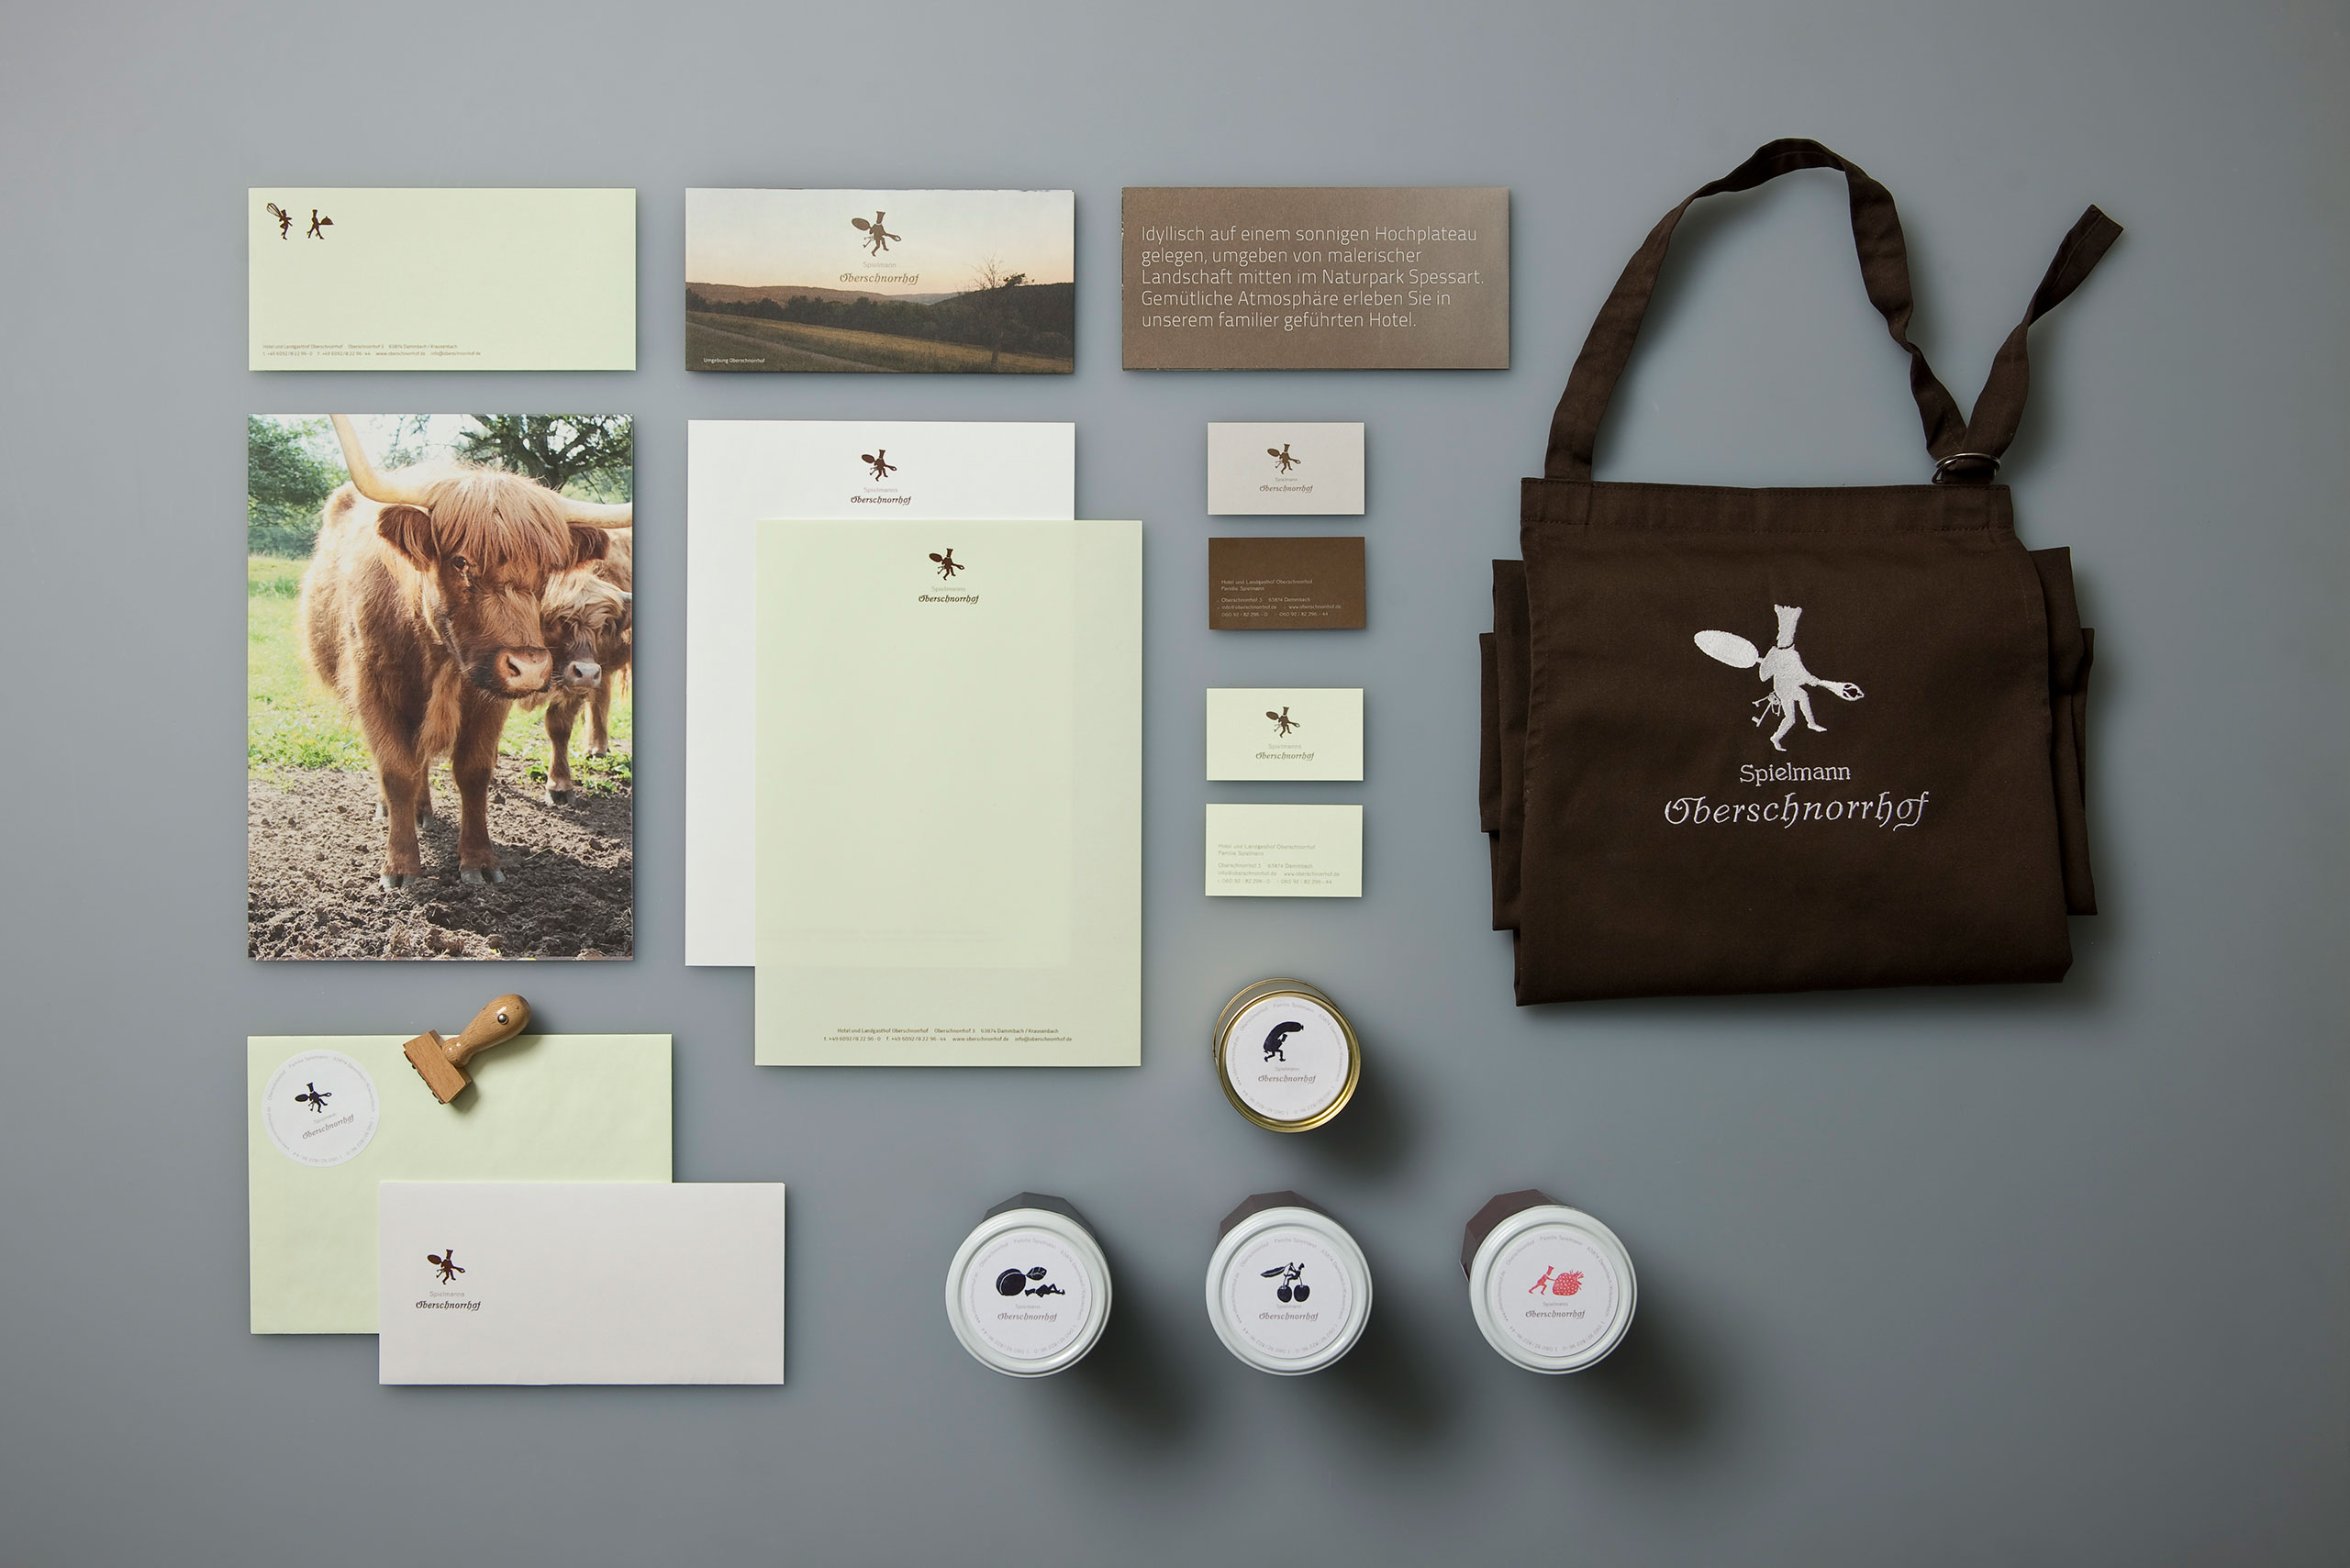 Visitenkarten, Flyer, Briefpapier, geschäftsausstattung, Verpackungen, Schürze, Restaurant, Corporate Design